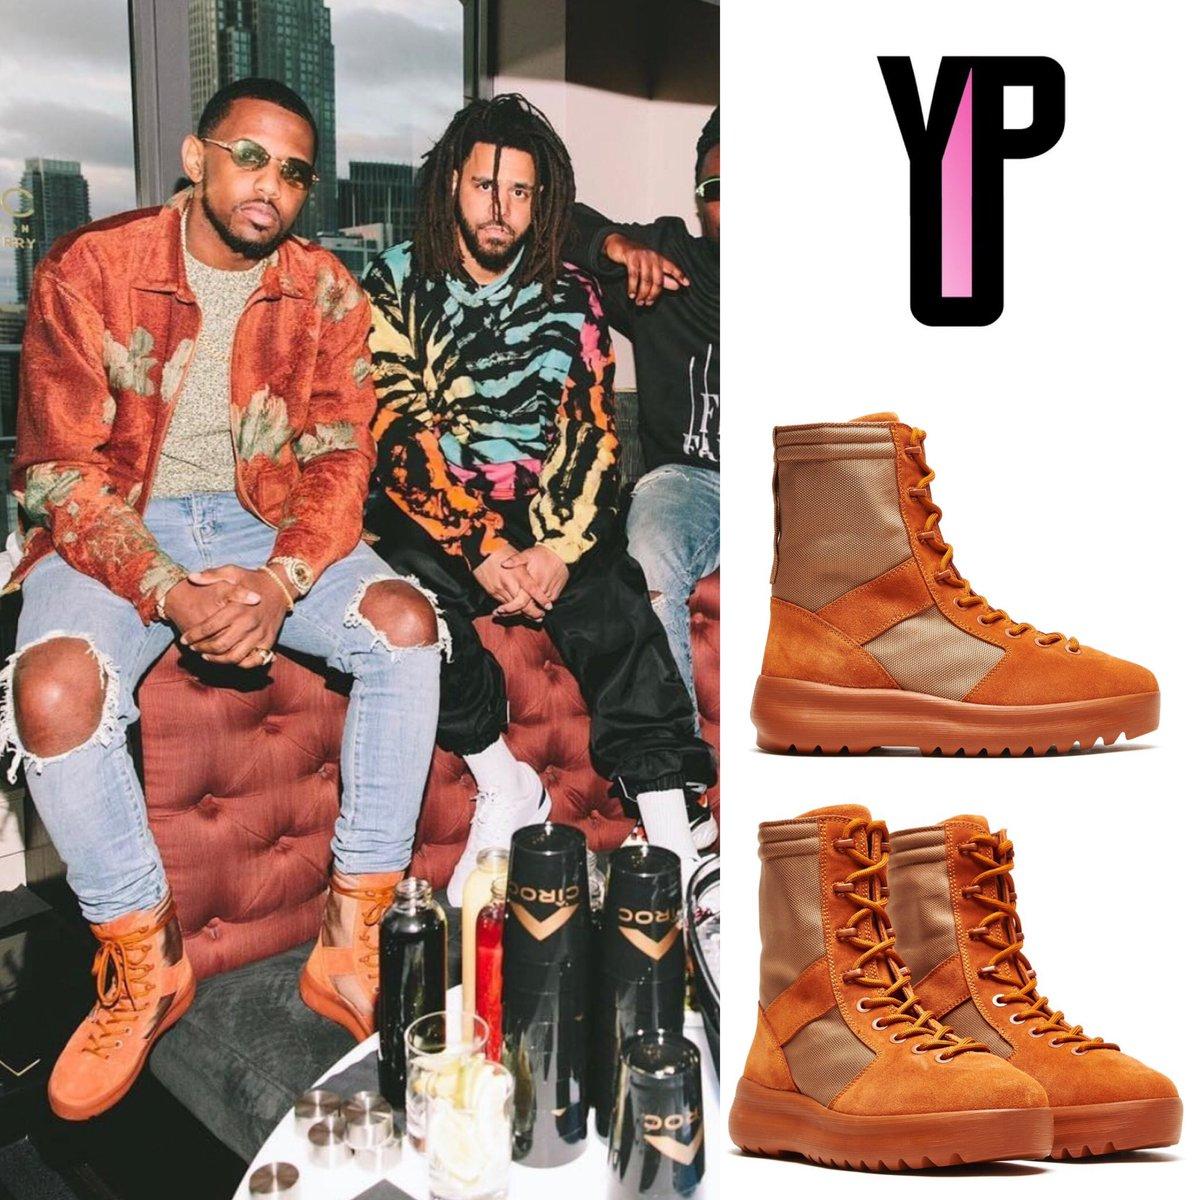 yeezy season 3 boots burnt sienna